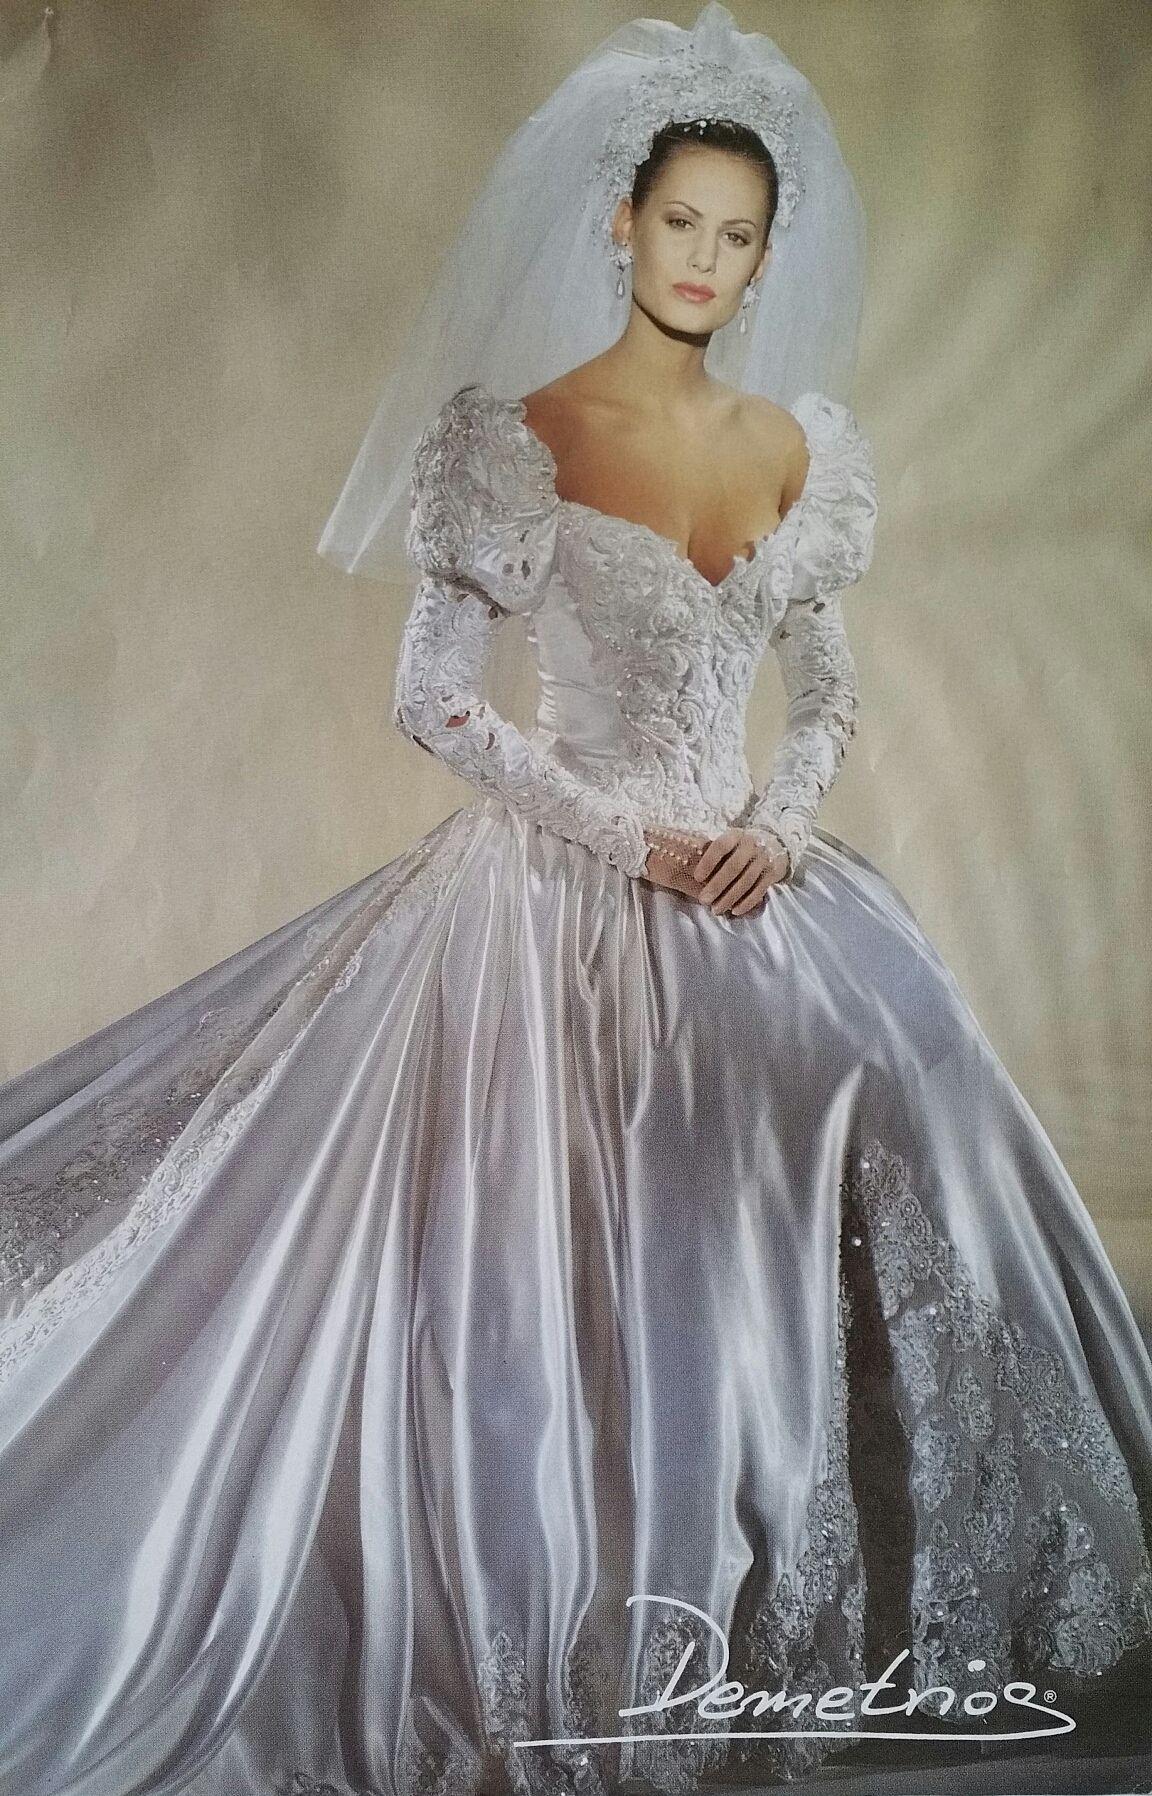 Demetrios 1994 Antique Wedding Dresses Beautiful Wedding Gowns Wedding Dresses 80s